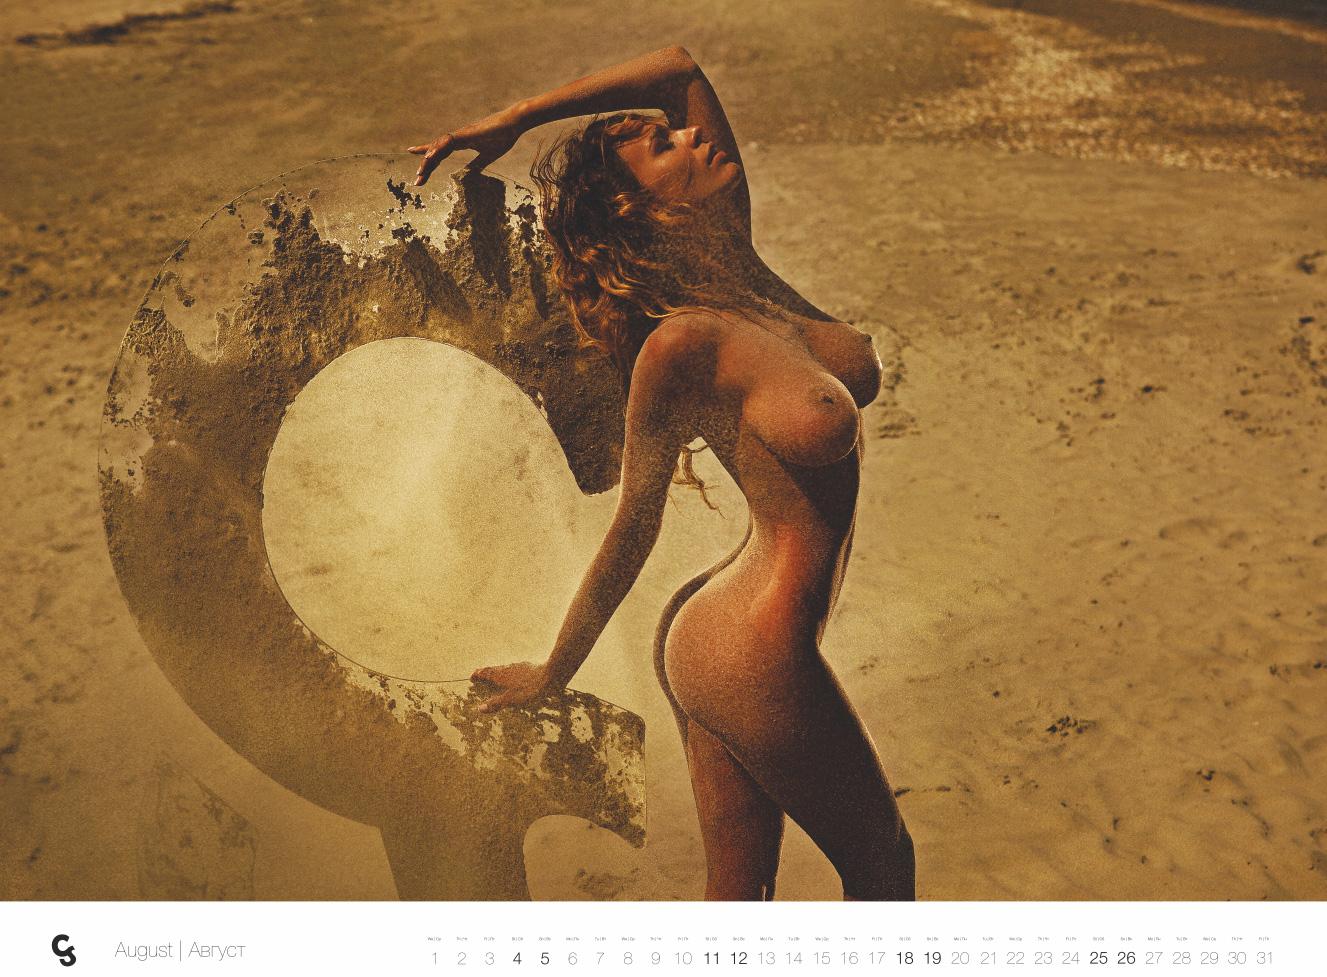 nude-make-an-erotic-calendar-orgy